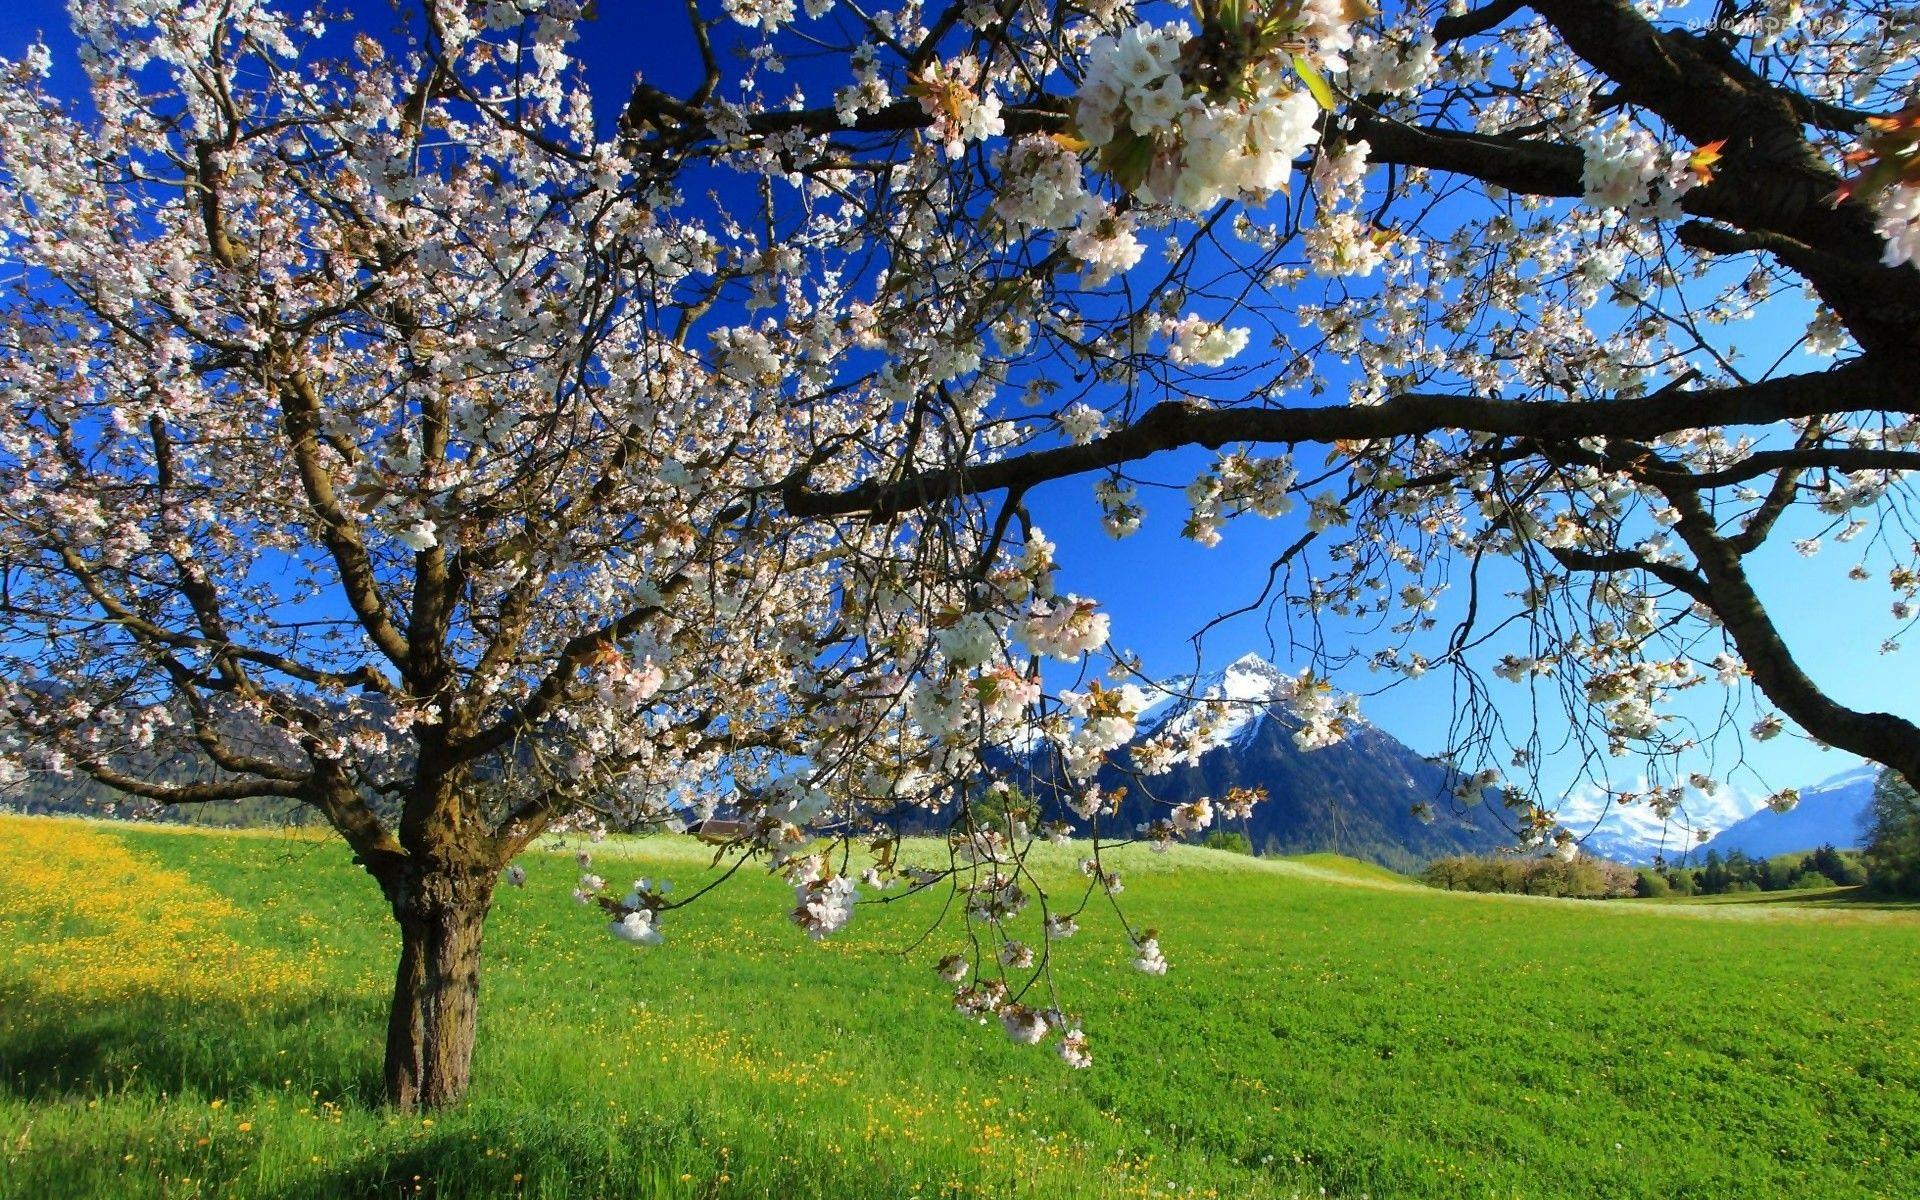 Wiosna Kwitnace Owocowe Drzewa Gory Laka Spring Landscape Spring Images Landscape Wallpaper